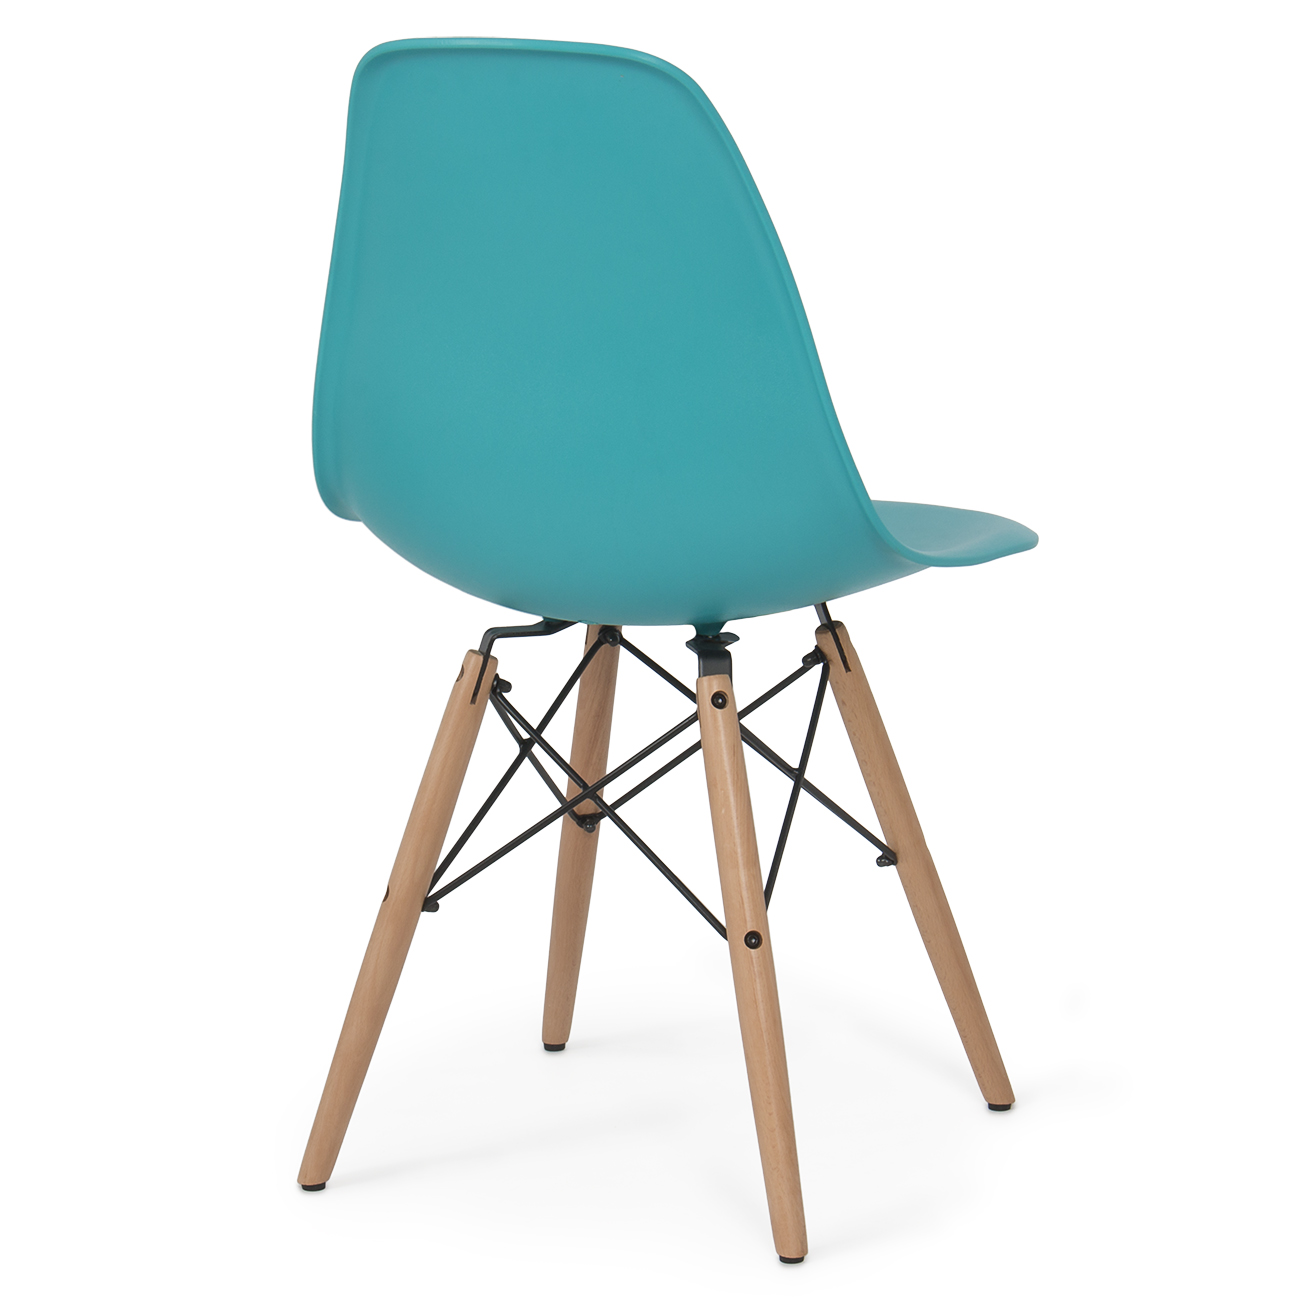 Eames premium molded abs eiffel dowel leg dsw style dining side set of 2 chair - Eames dsw eiffel chair ...